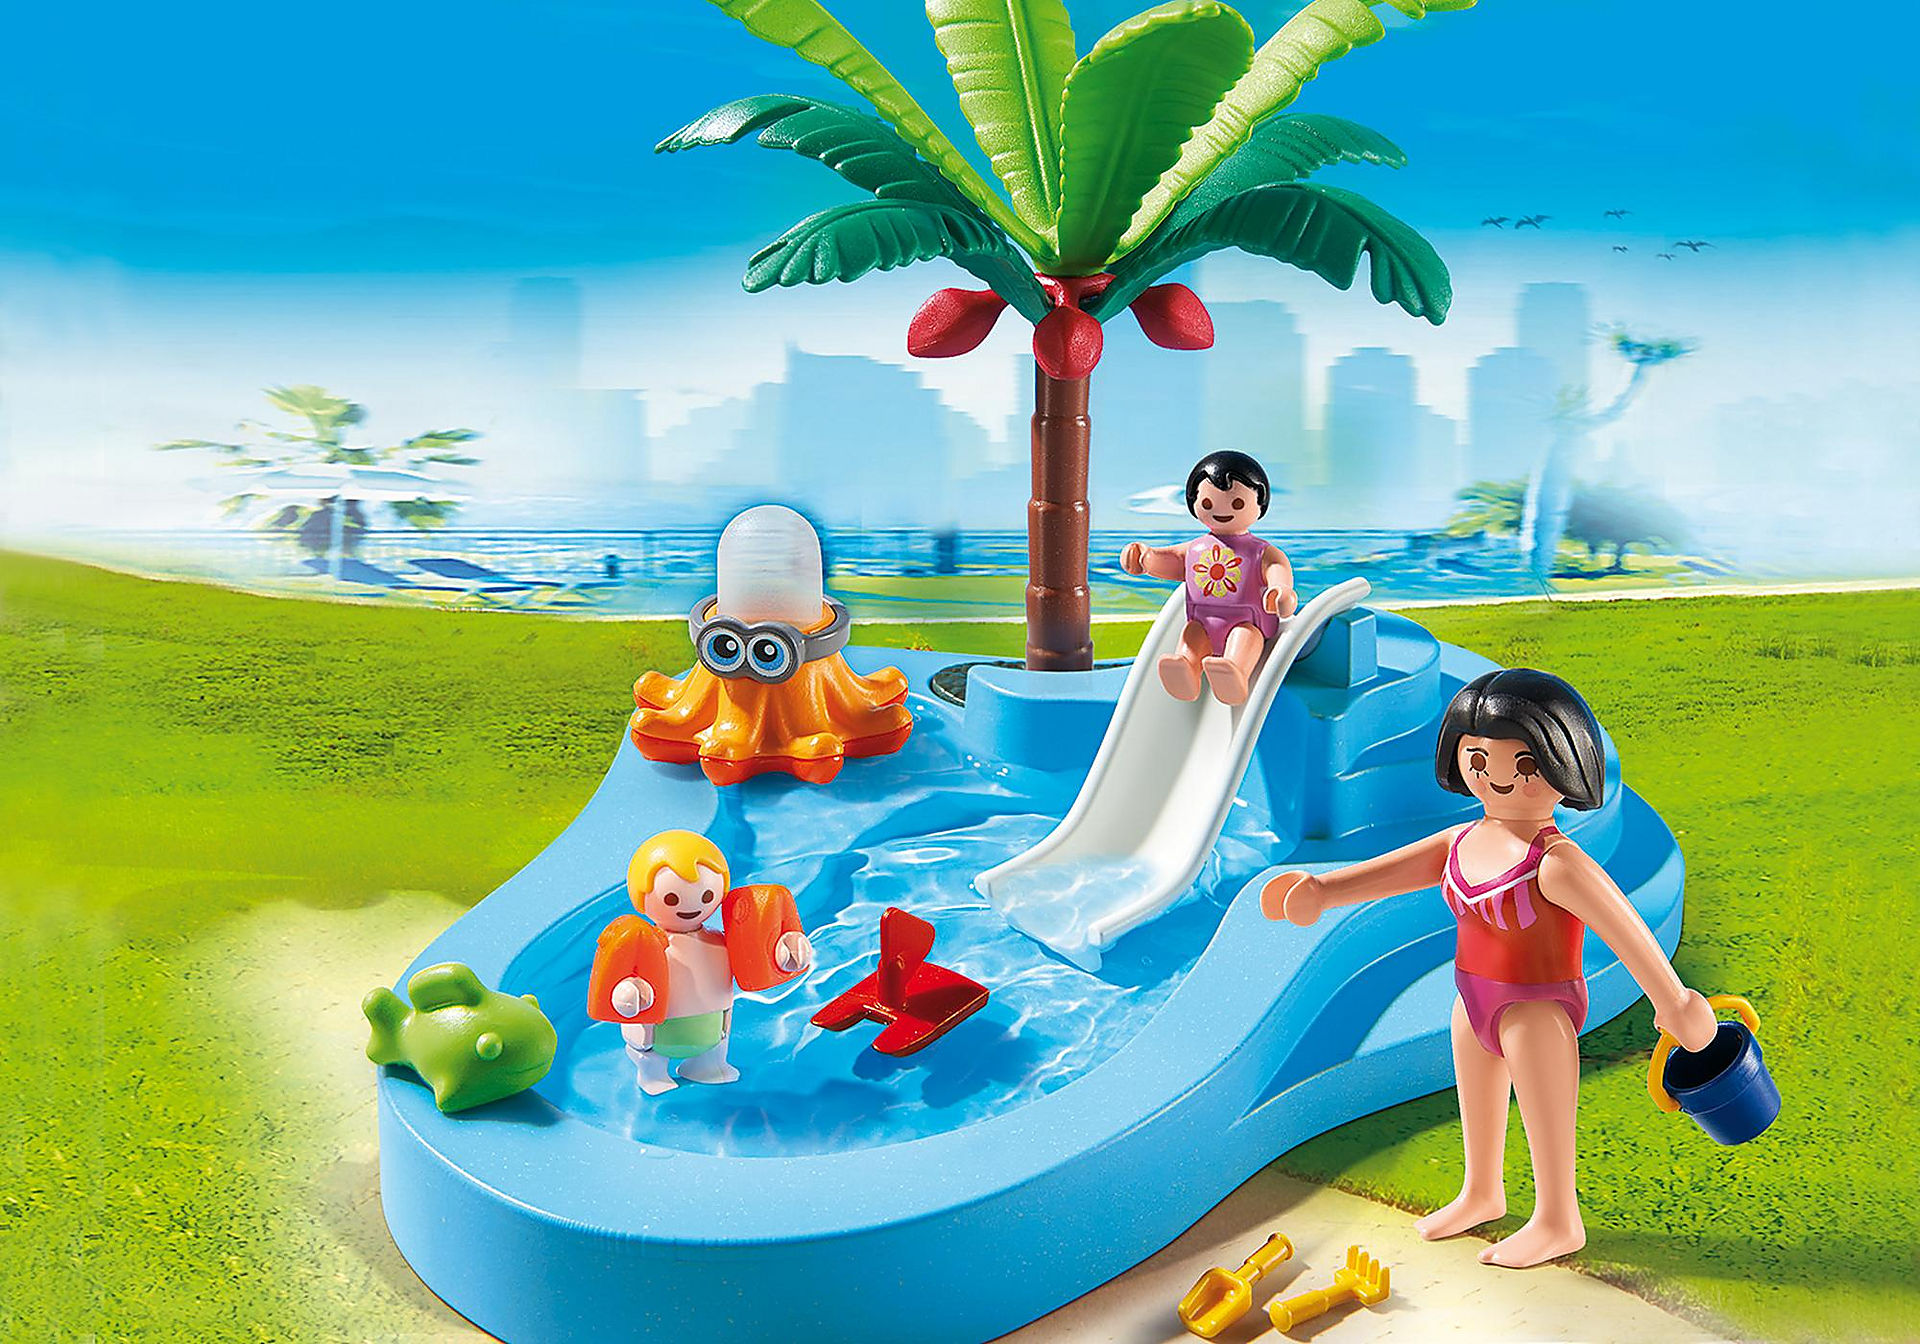 http://media.playmobil.com/i/playmobil/6673_product_detail/Babybecken mit Rutsche